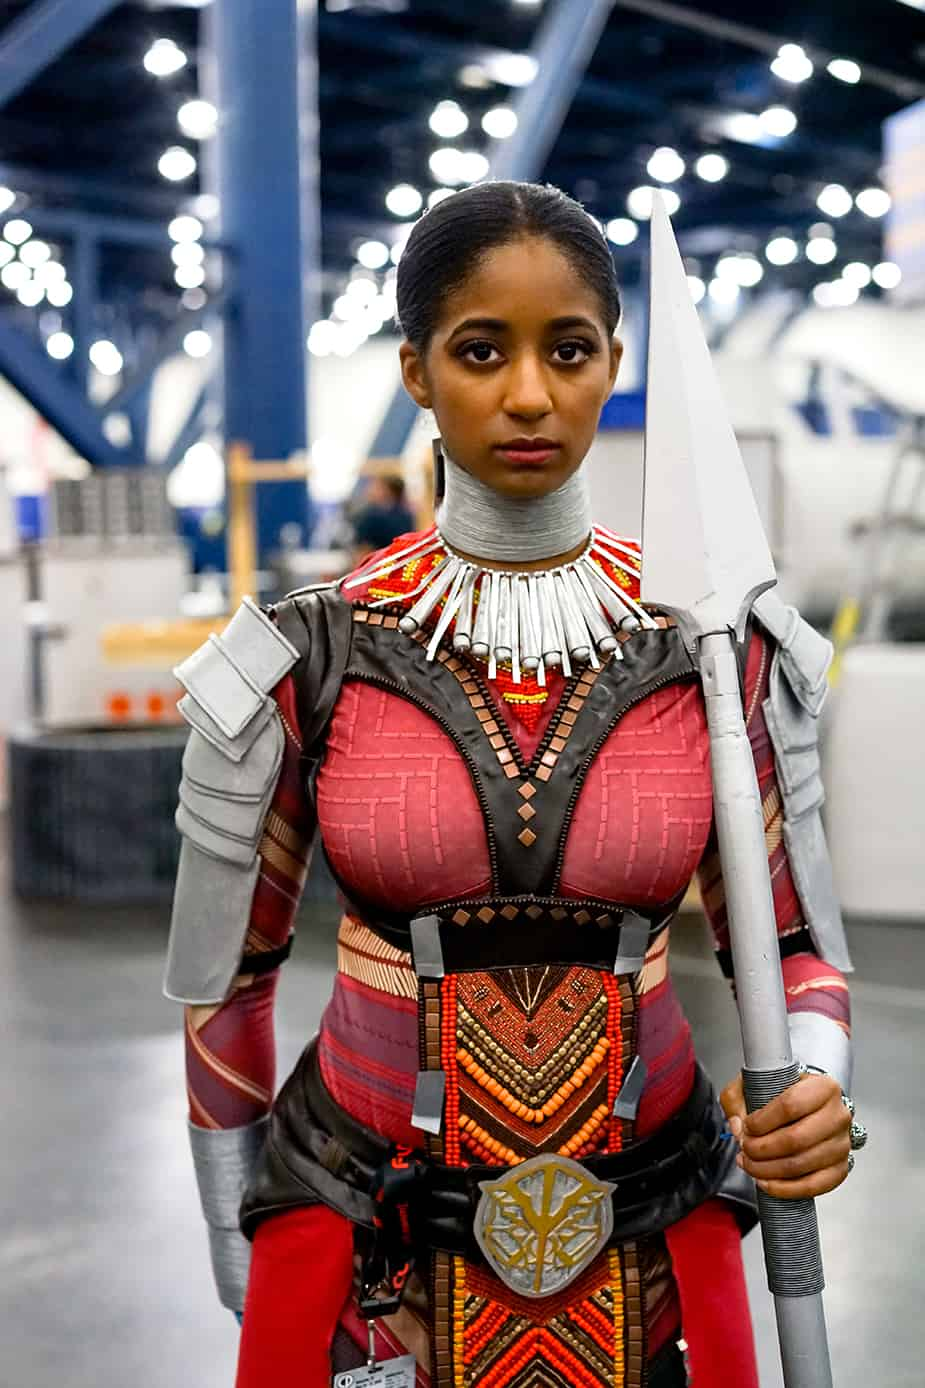 Black Panther Dora Milaje African American Cosplay Comicpalooza